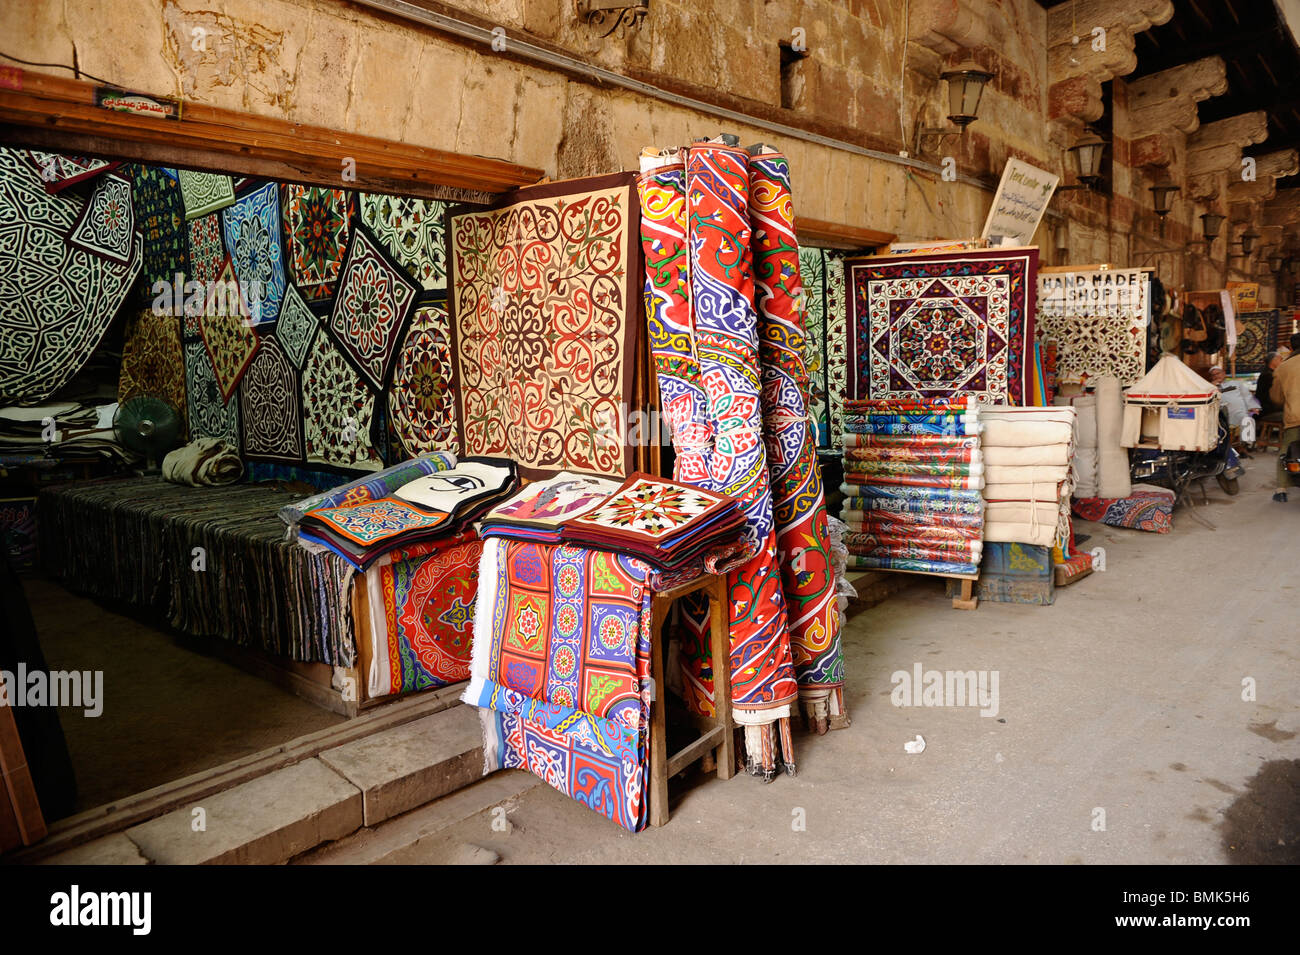 Tentmakers Bazaar (Souq Al-Khiamiyya), Cairo, Egypt Stock